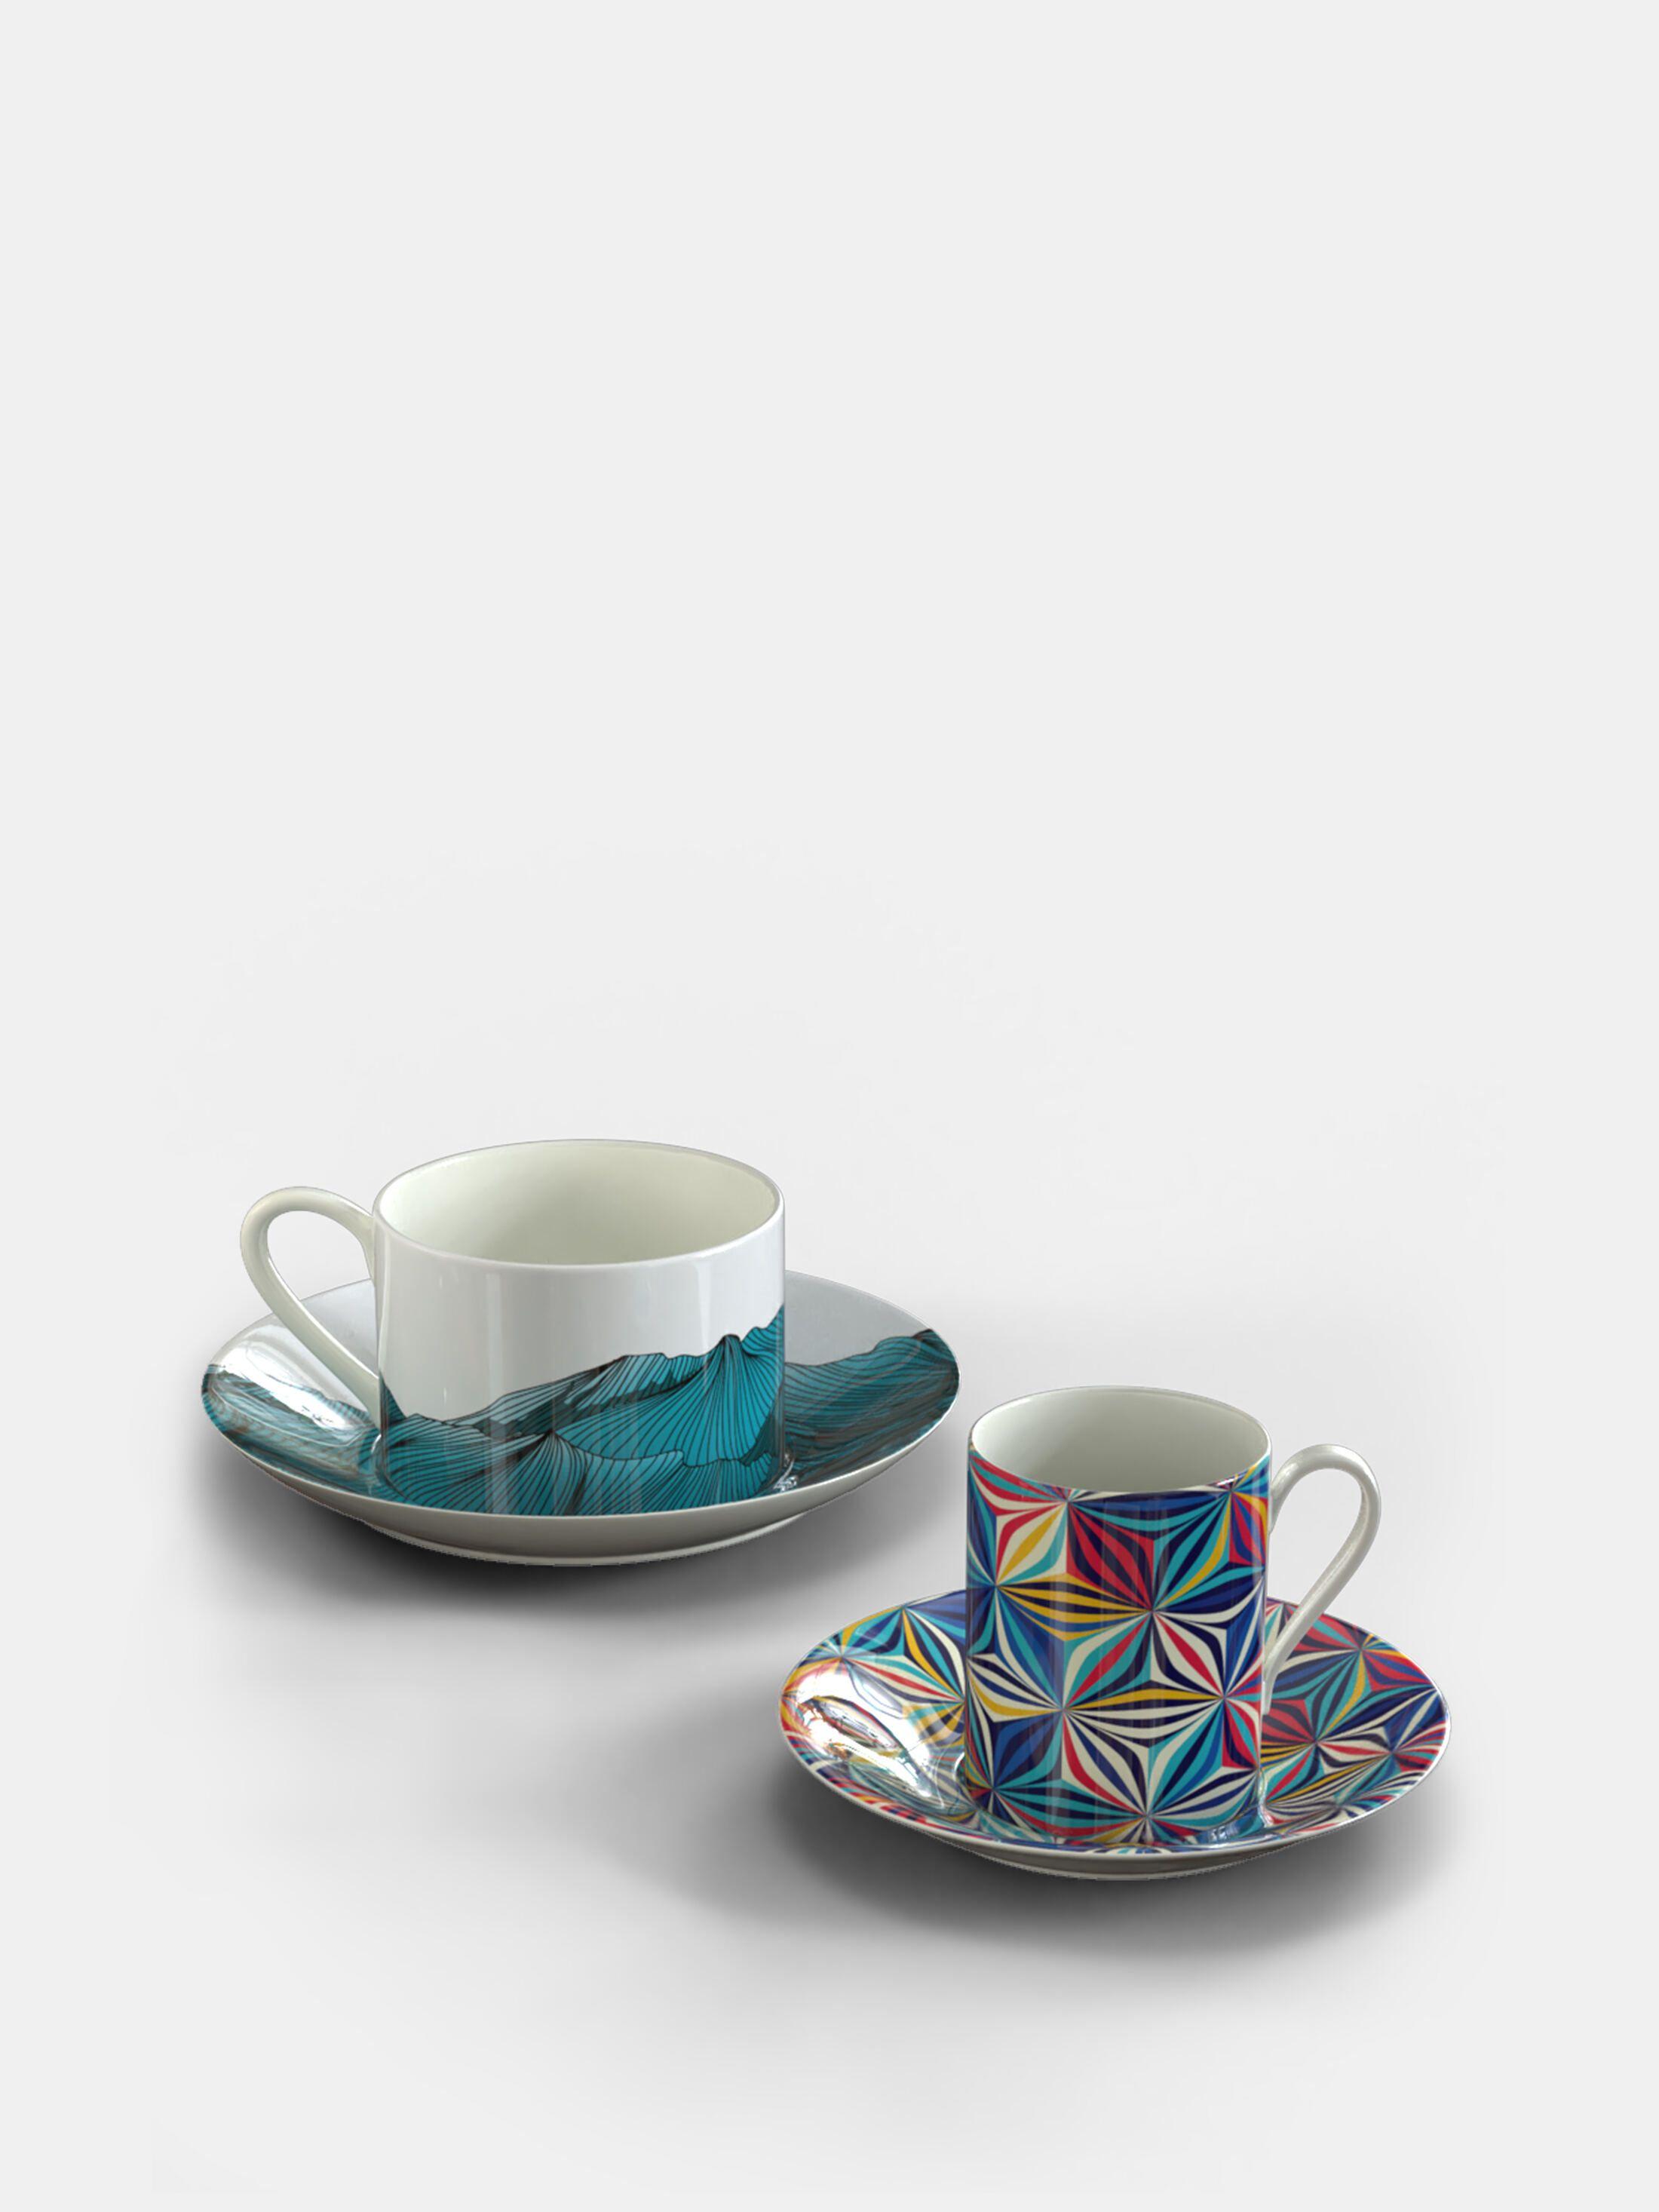 designa din egen kopp